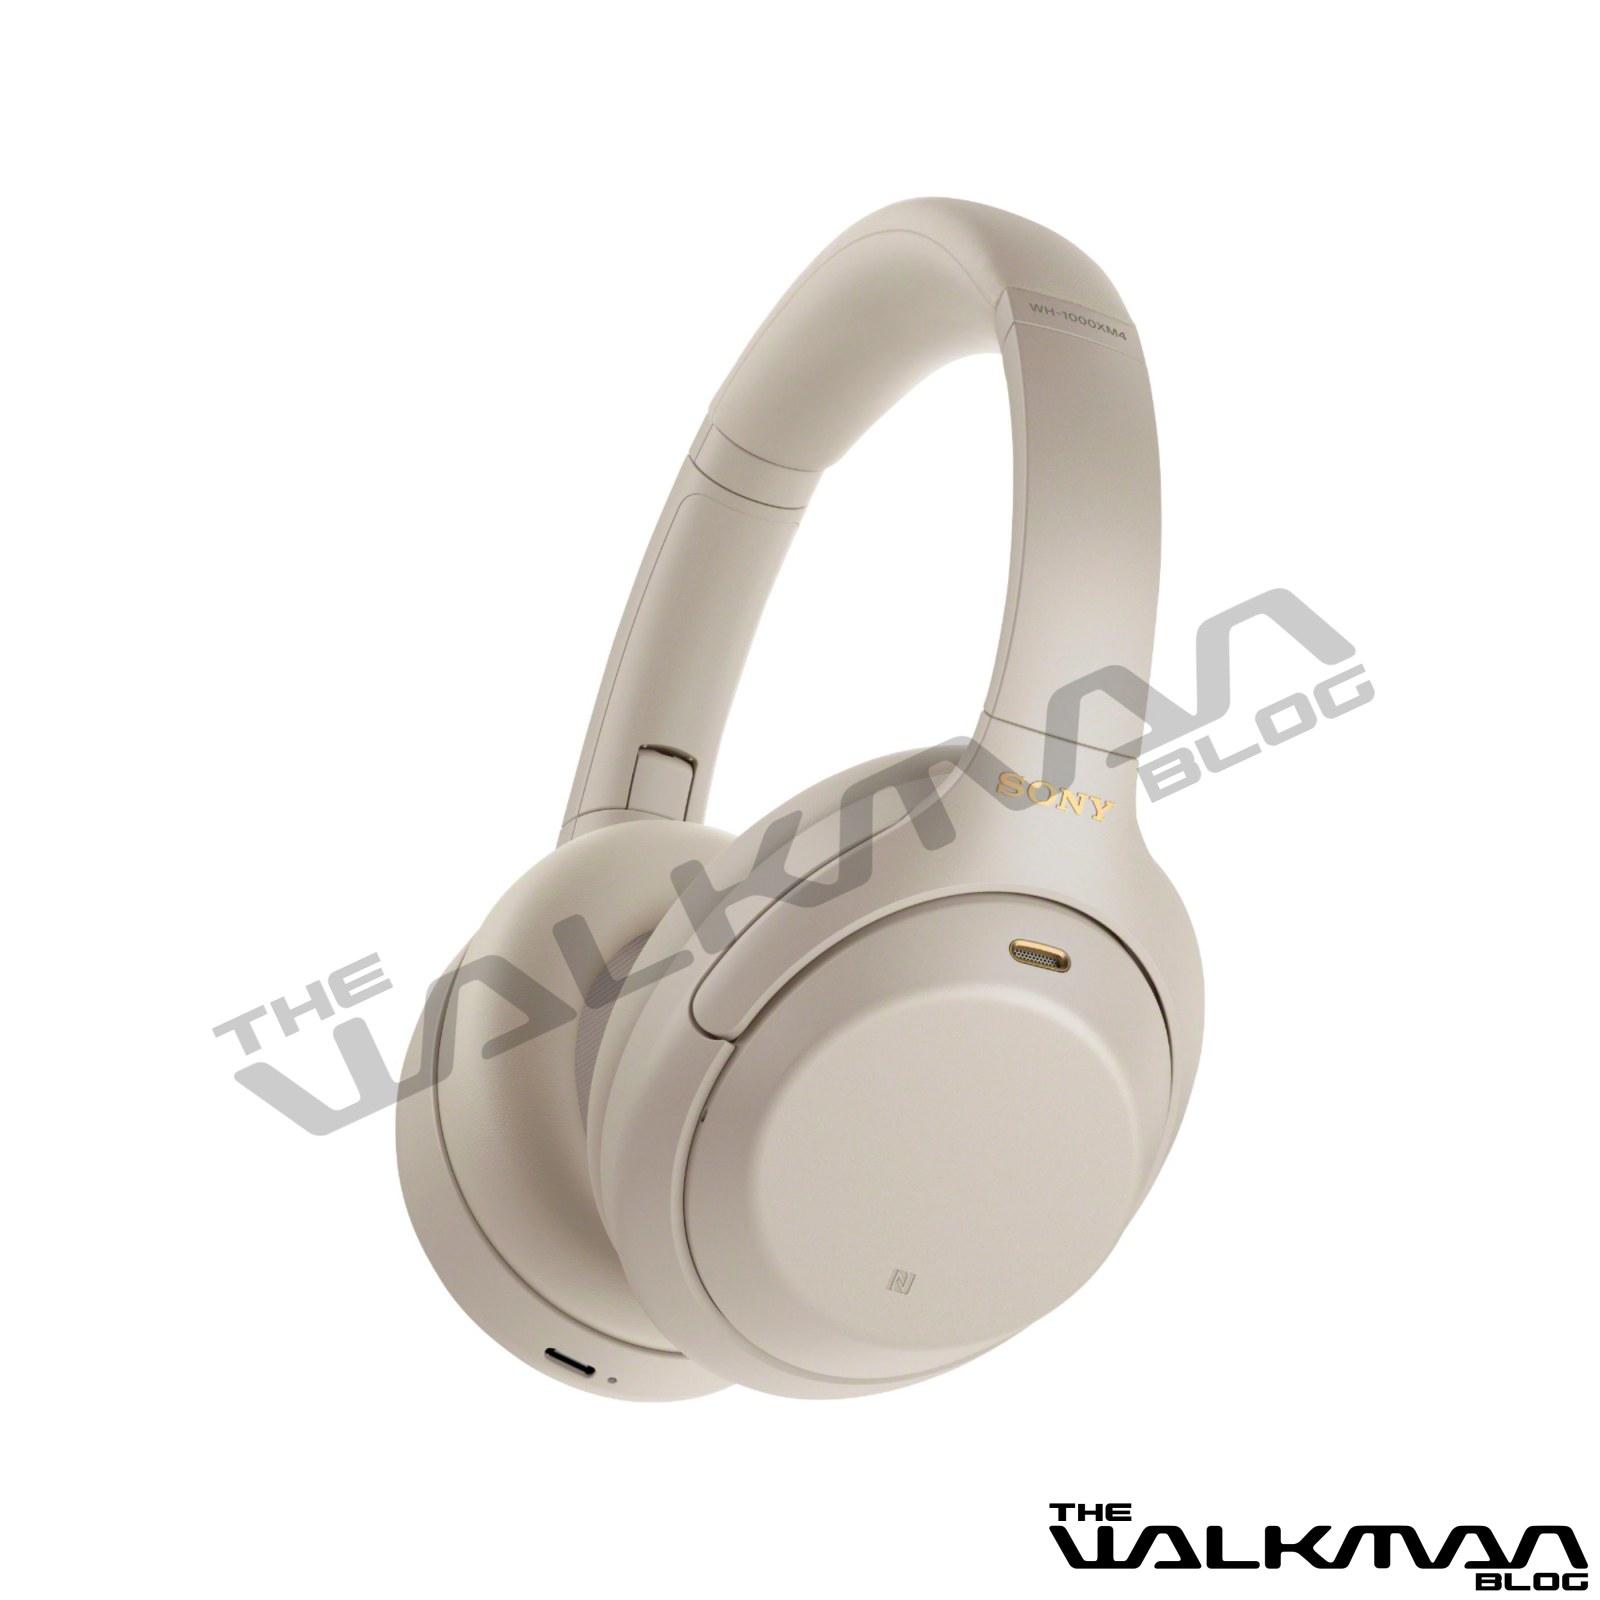 The Walkman Blog: Sony WH-1000XM4 Leaked by Best Buy